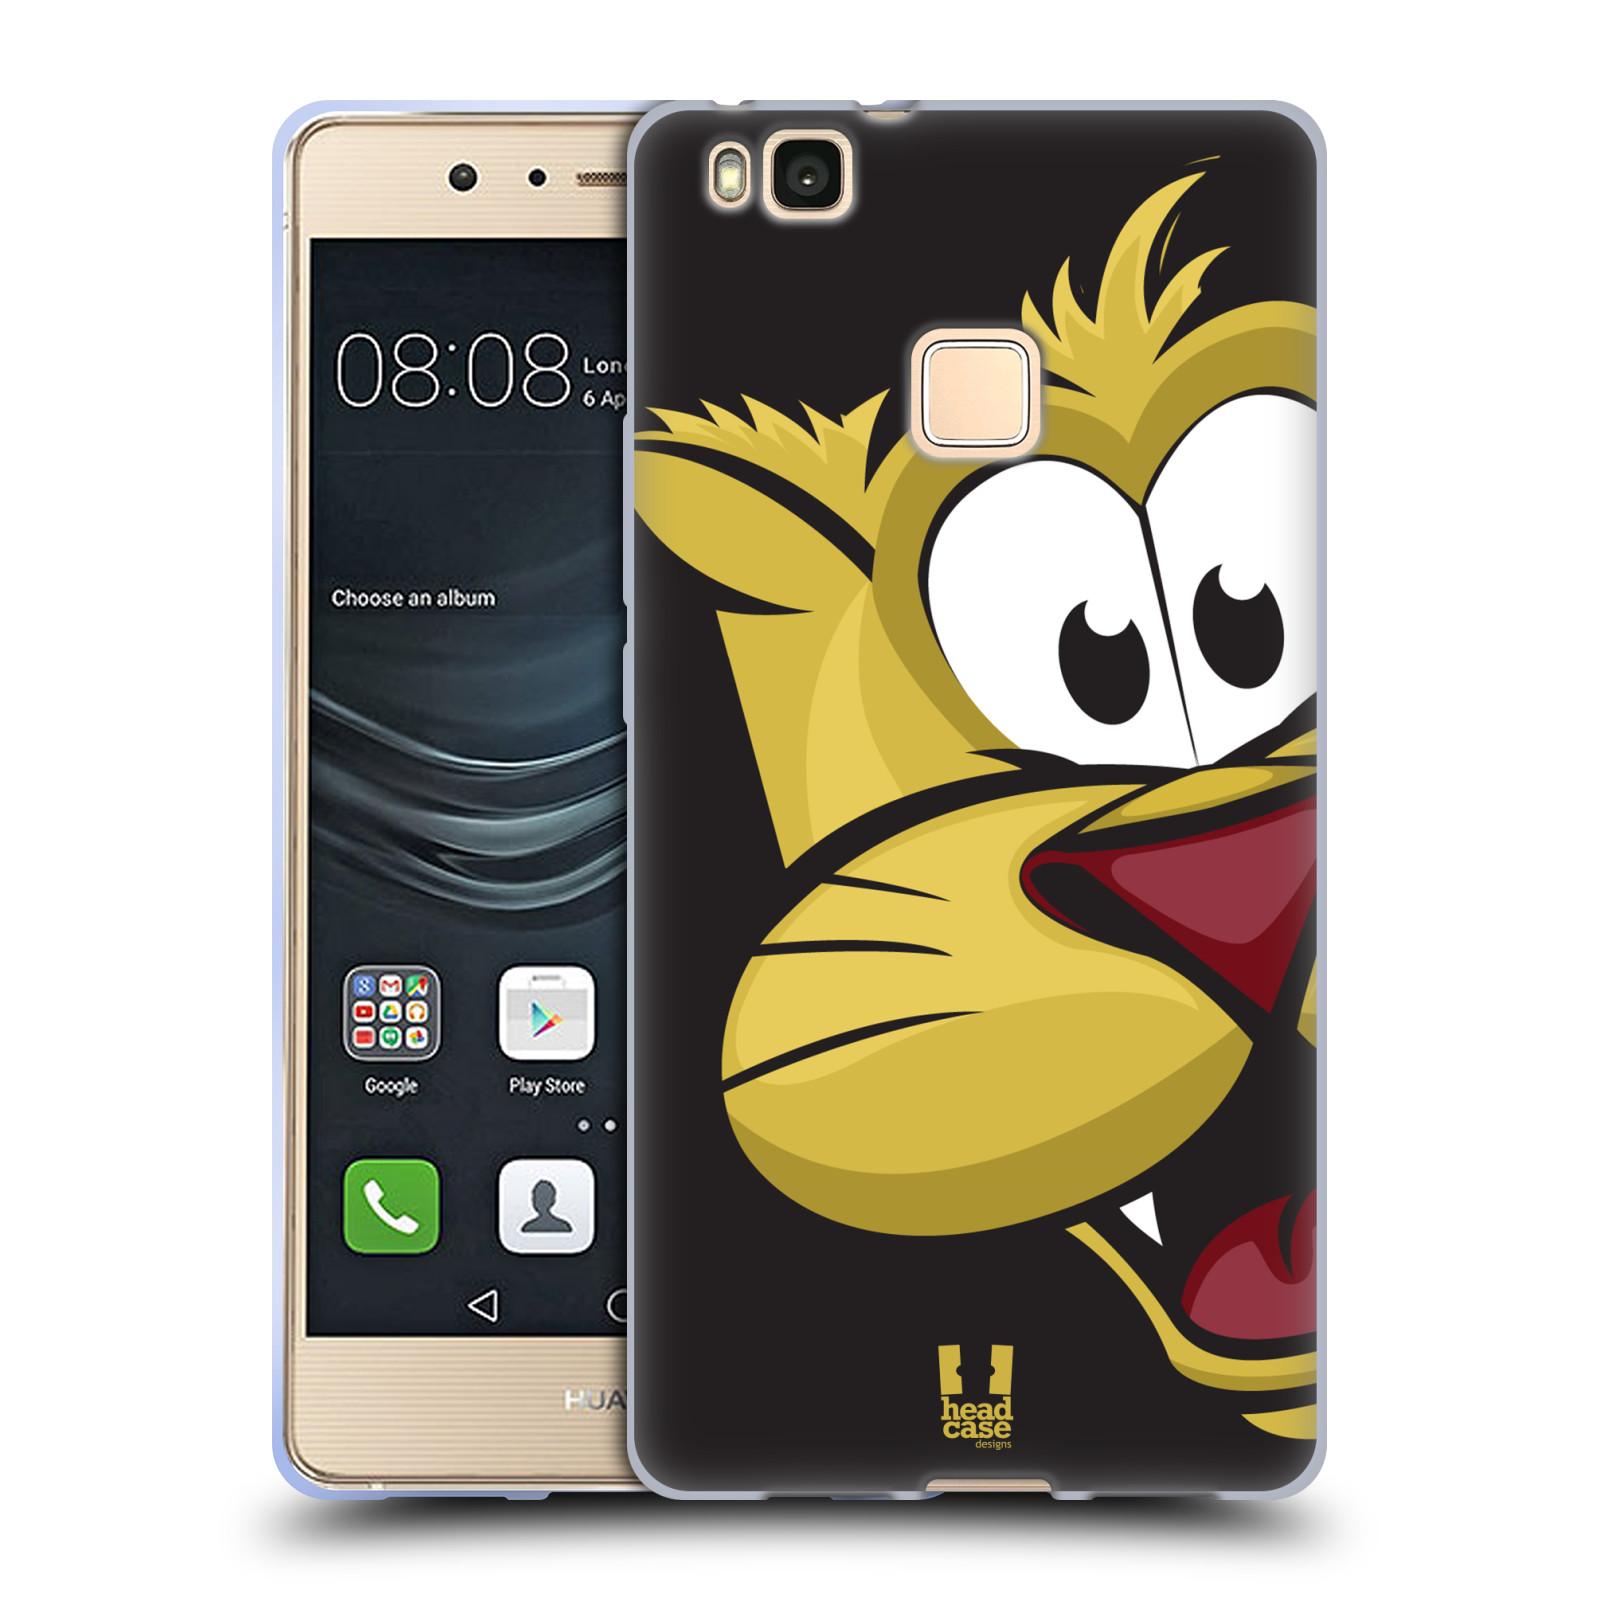 Silikonové pouzdro na mobil Huawei P9 Lite - Head Case - ROZTOMILÝ TYGŘÍK